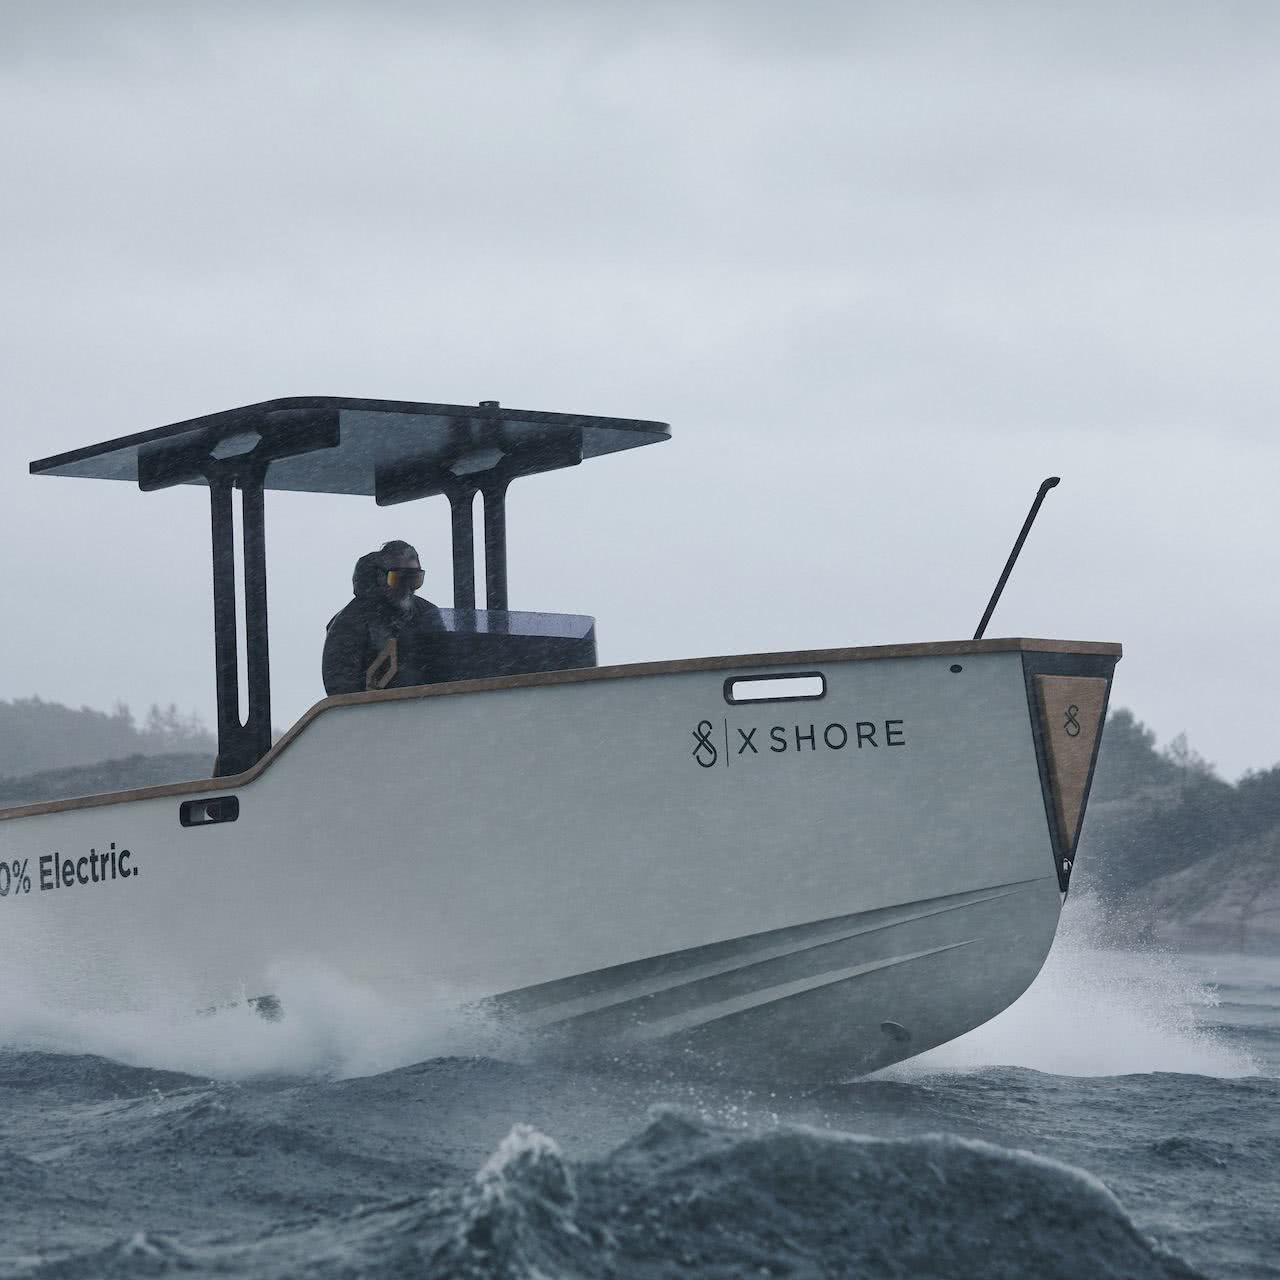 X Shore Eelex 8000 Electric Boat Konrad Bergström